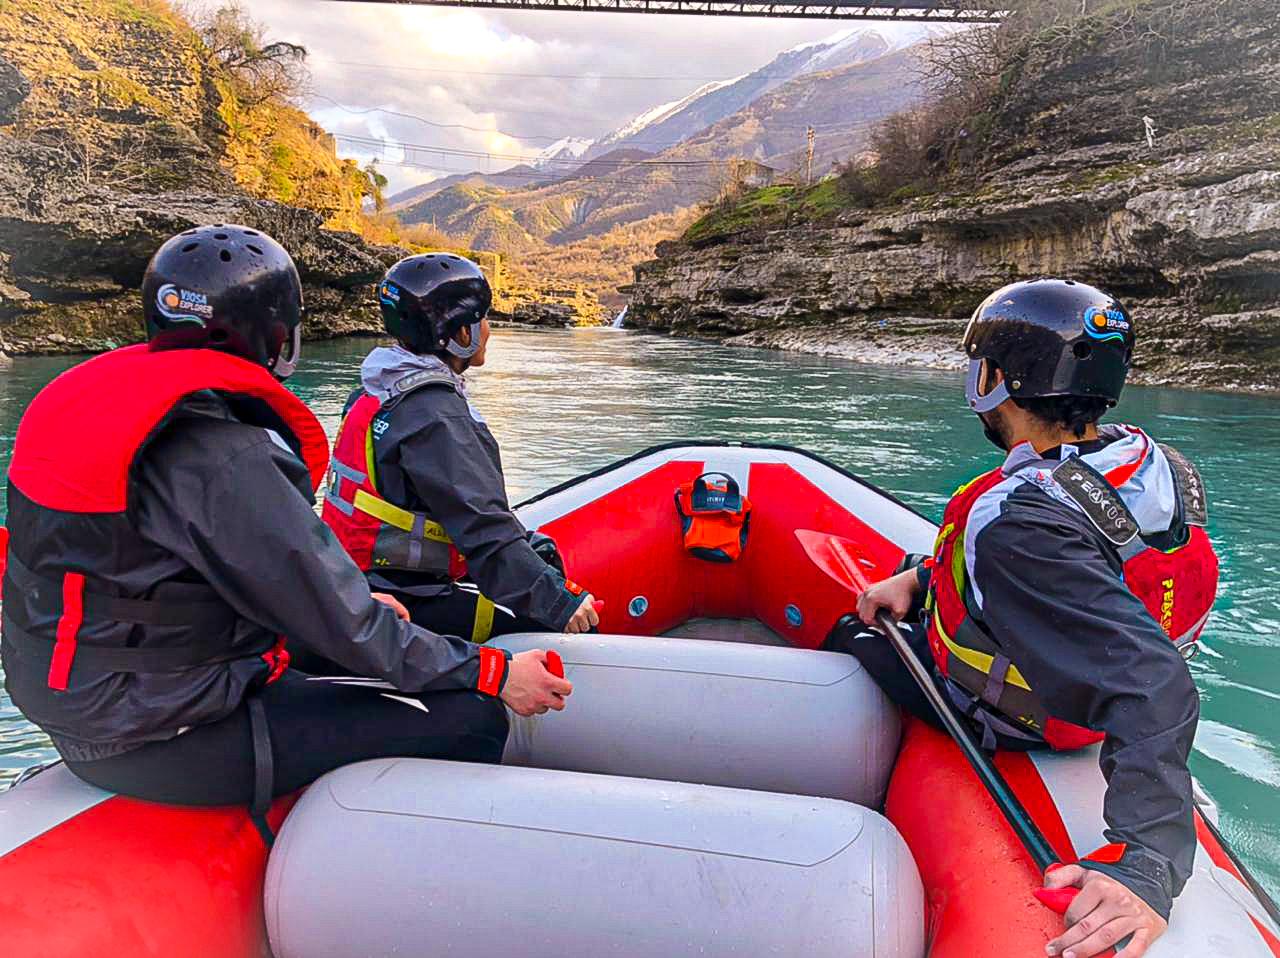 Rafting at Vjosa River Albania - go as local